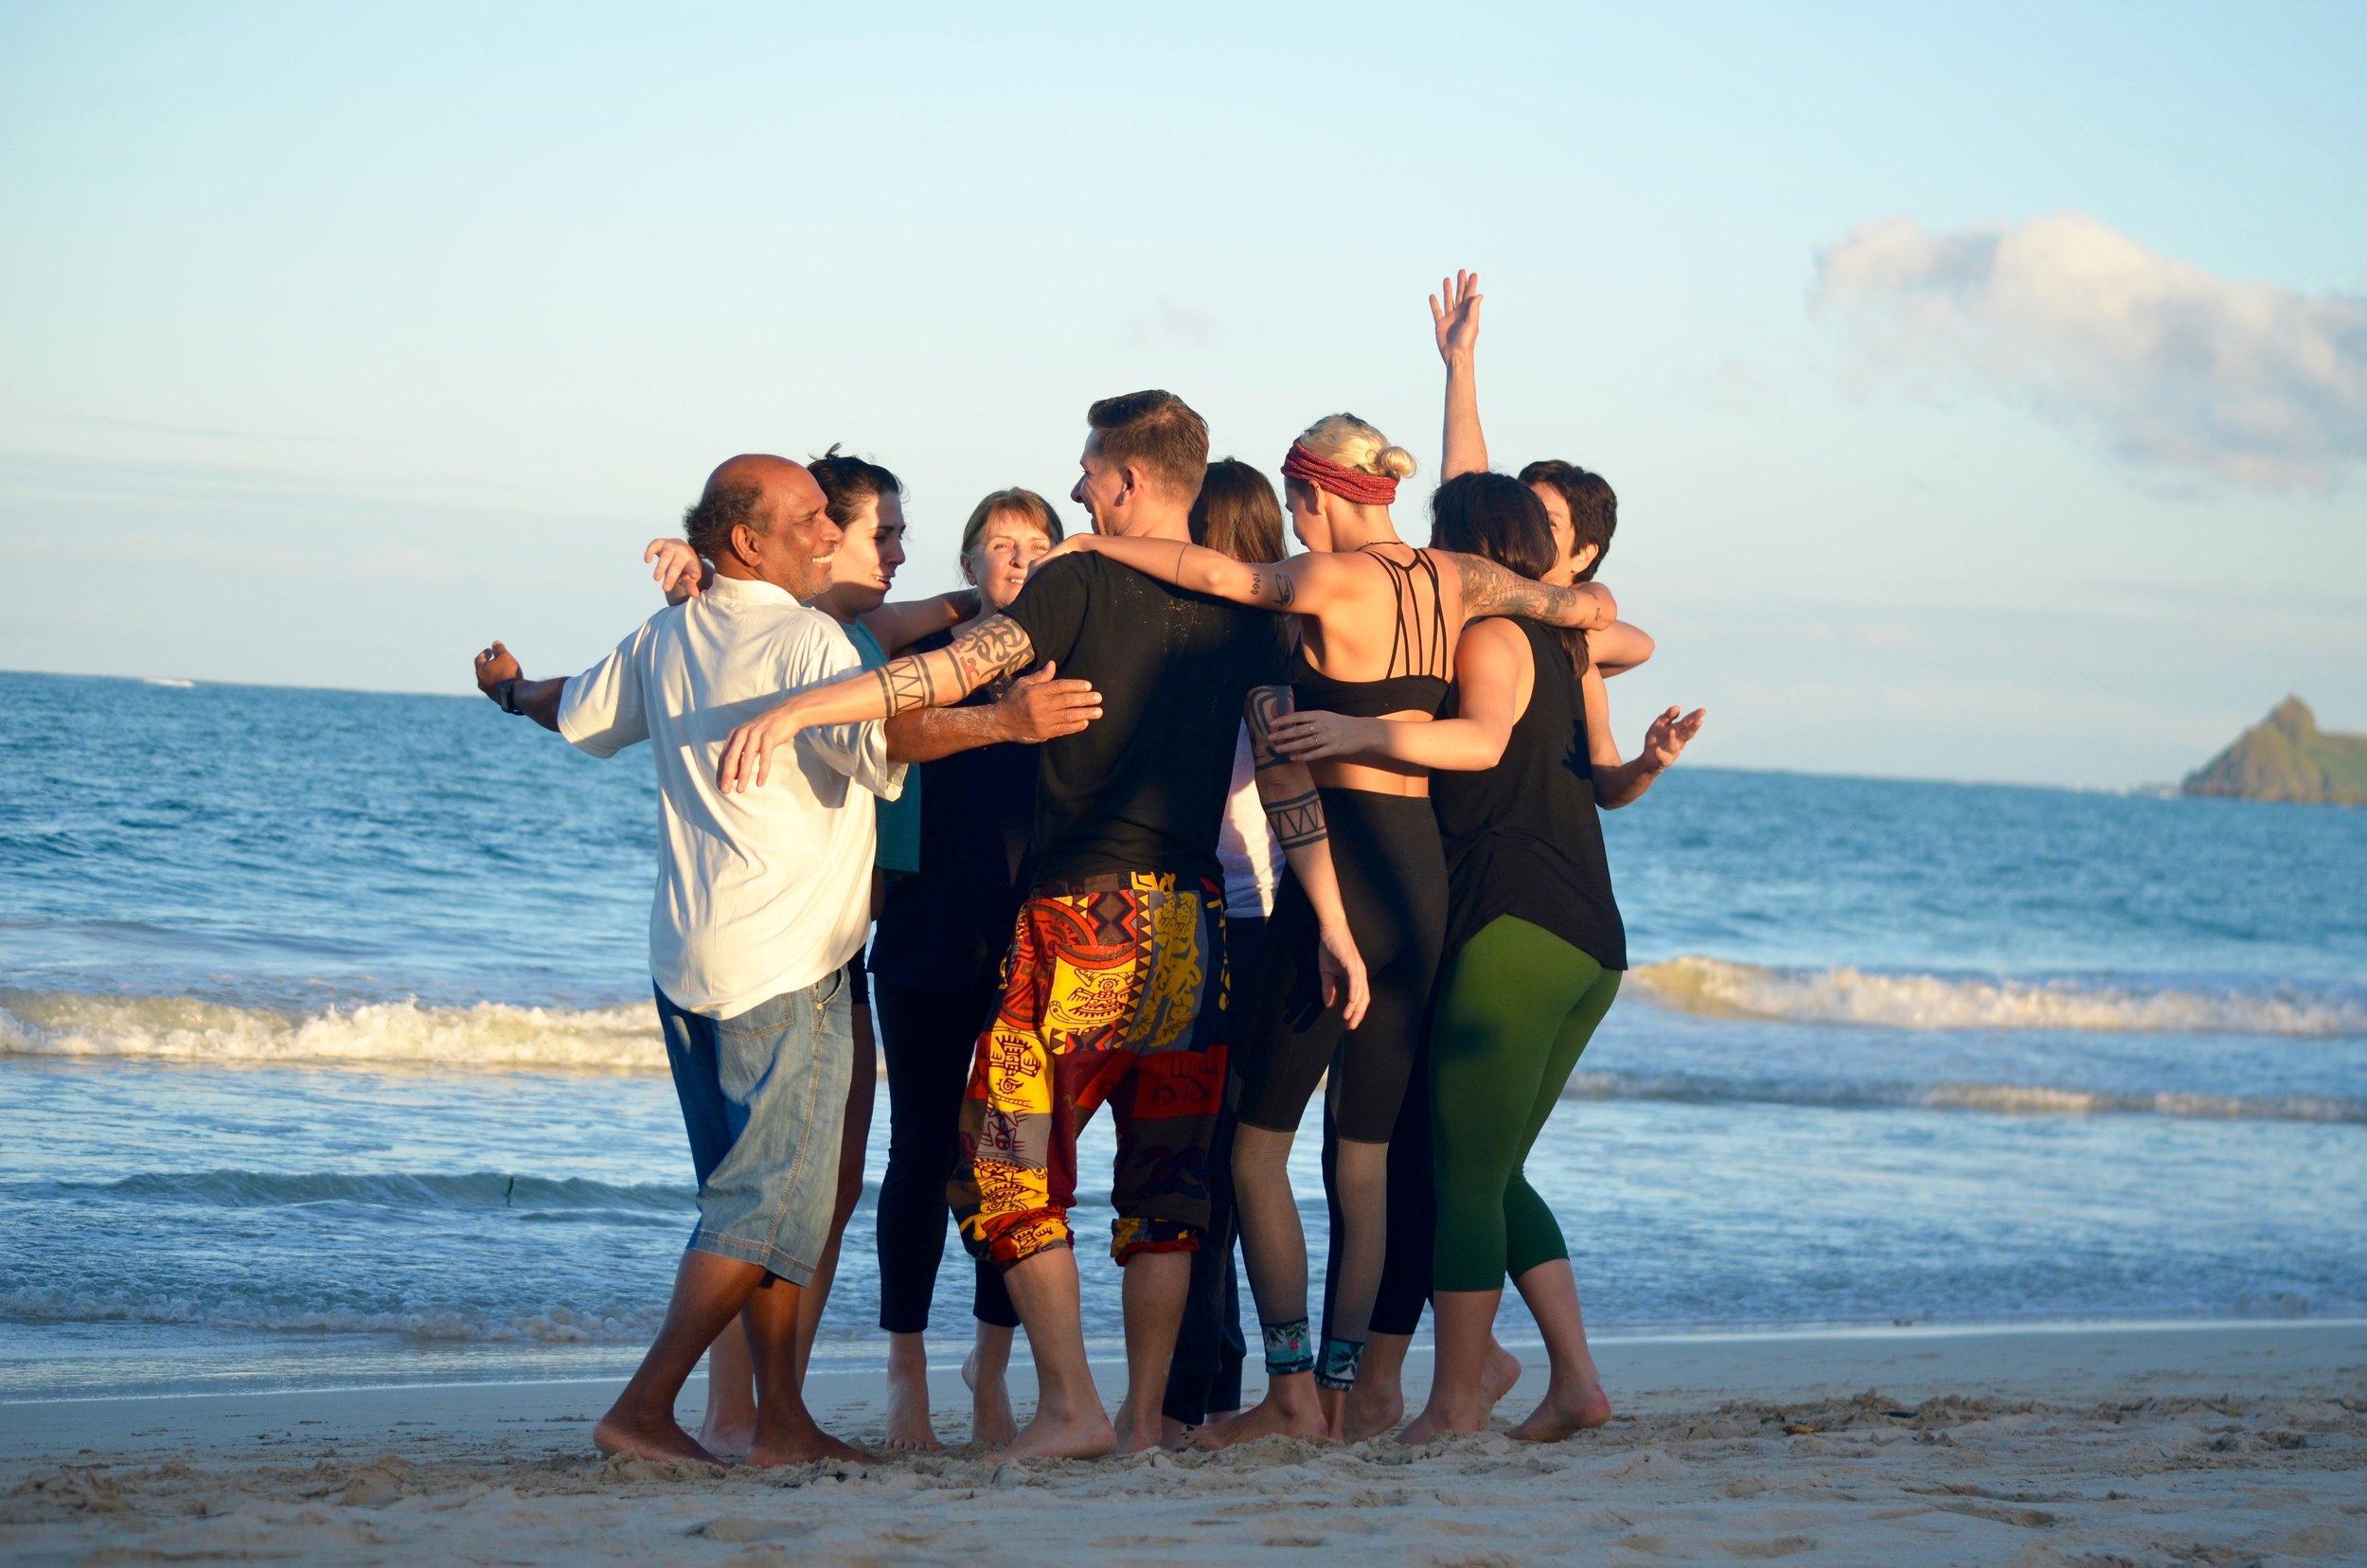 flow-yoga-teacher-training-santa-barbara-group-hug.jpg